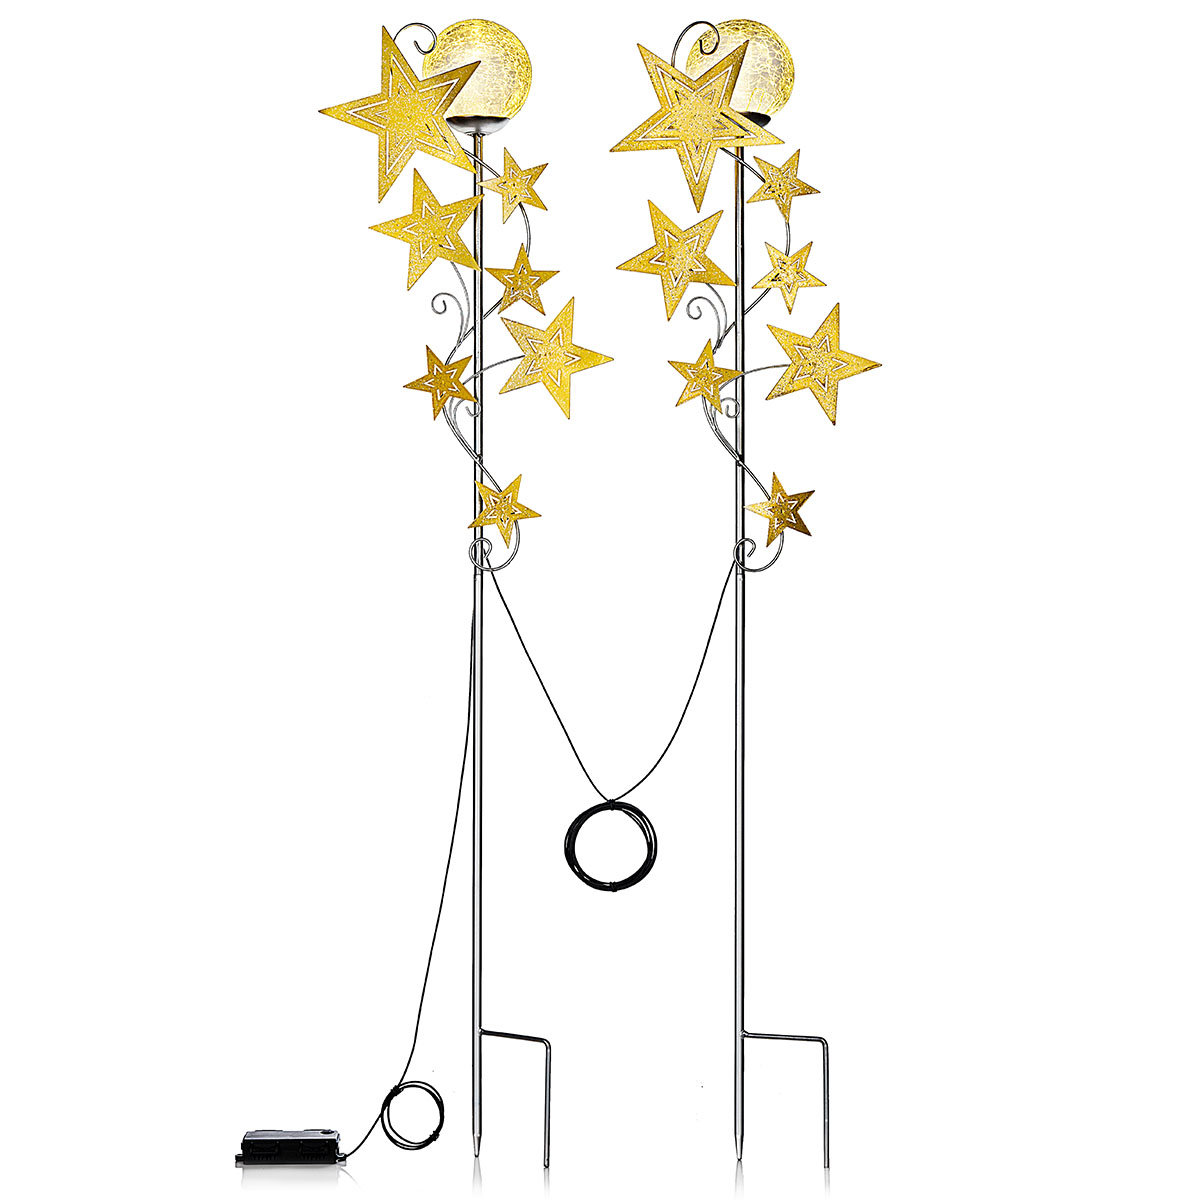 LED-Gartenstecker Sternenschweif, 2er-Set | #2